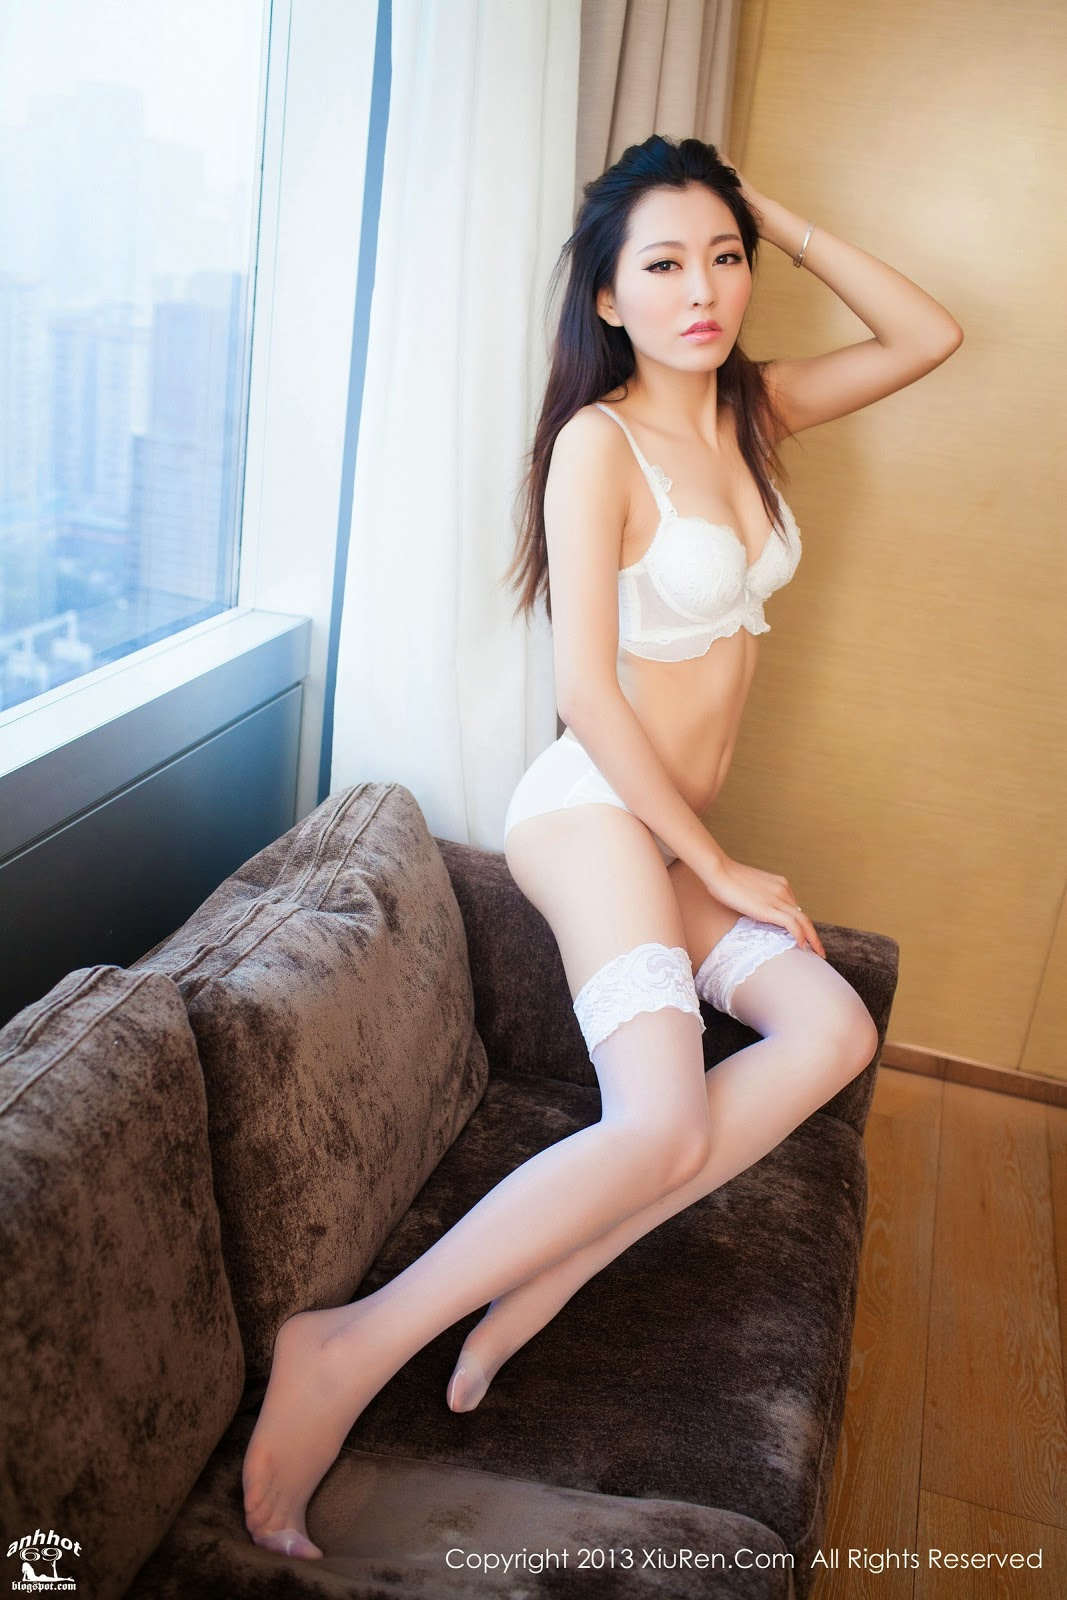 xiuren-xiuren-02491208